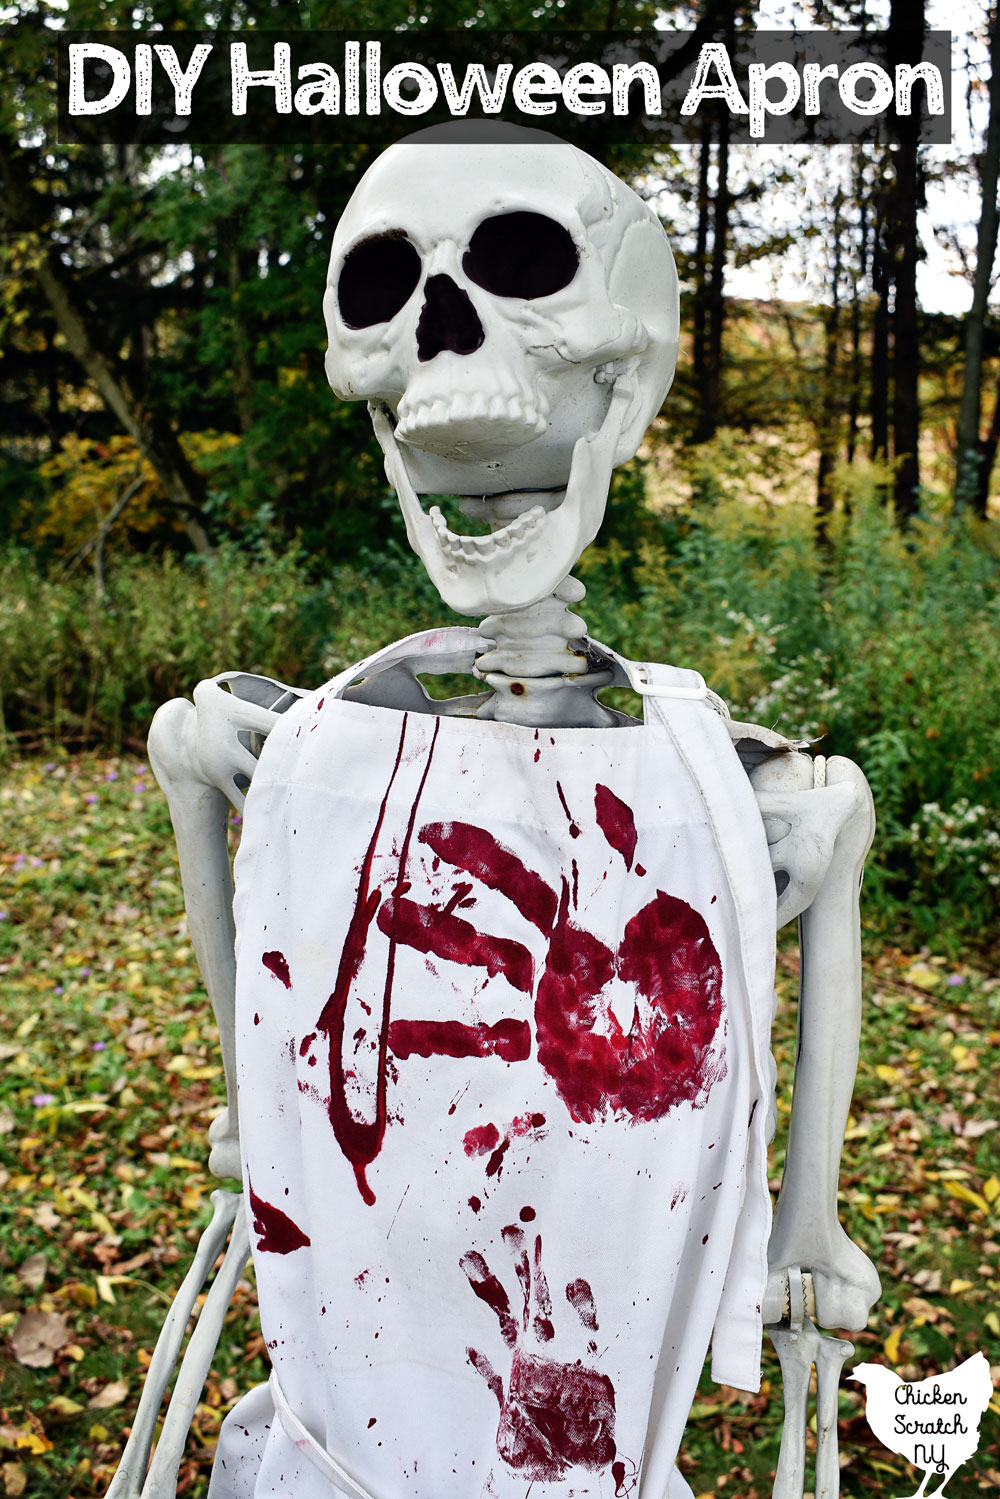 life sized Halloween skeleton wearing a white Bloody Halloween Apron